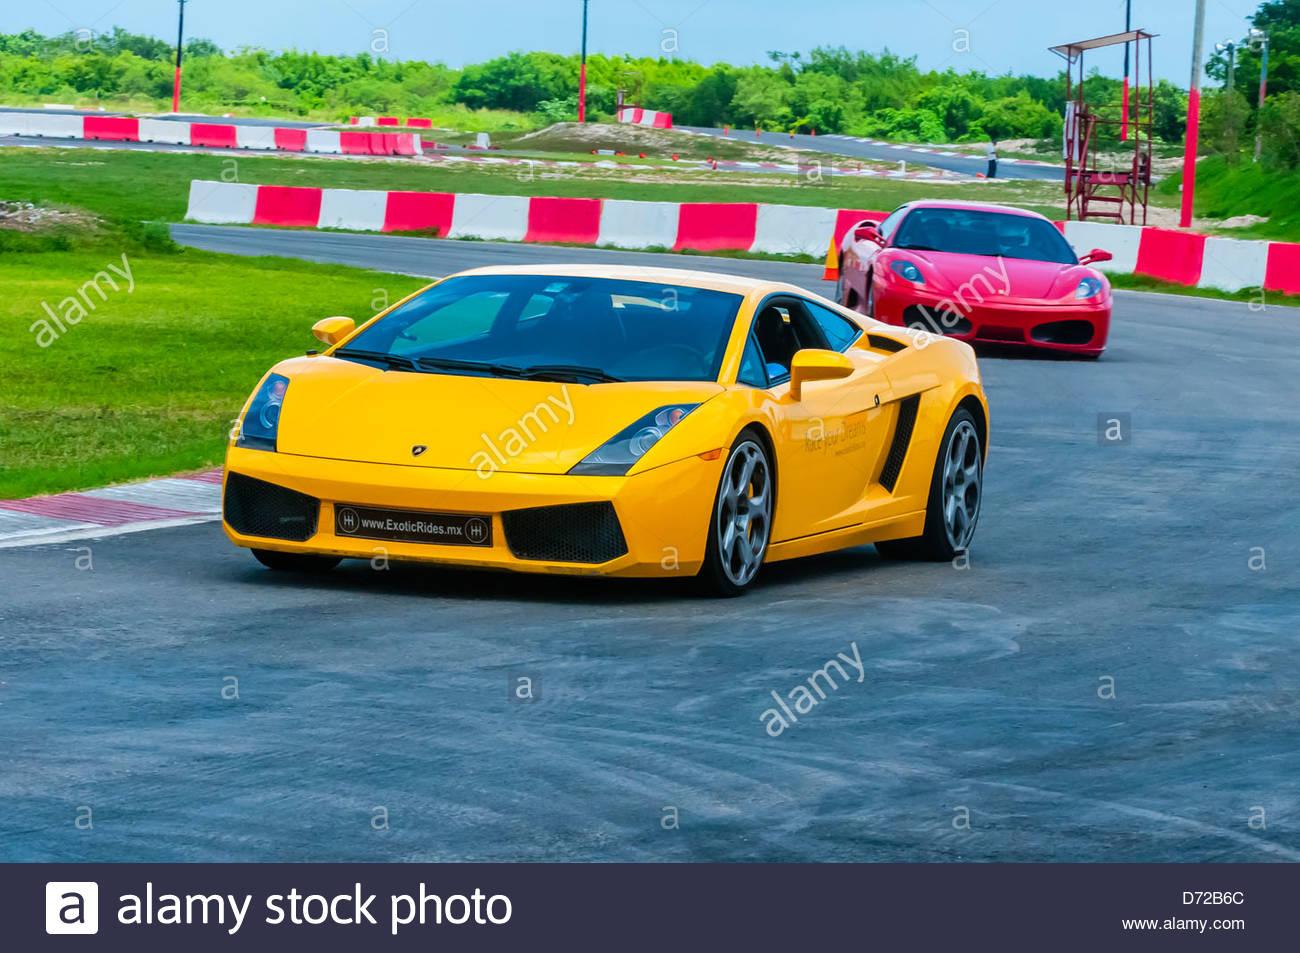 Lamborghini Gallardo Yellow And Ferrari F430 Red On The Track At